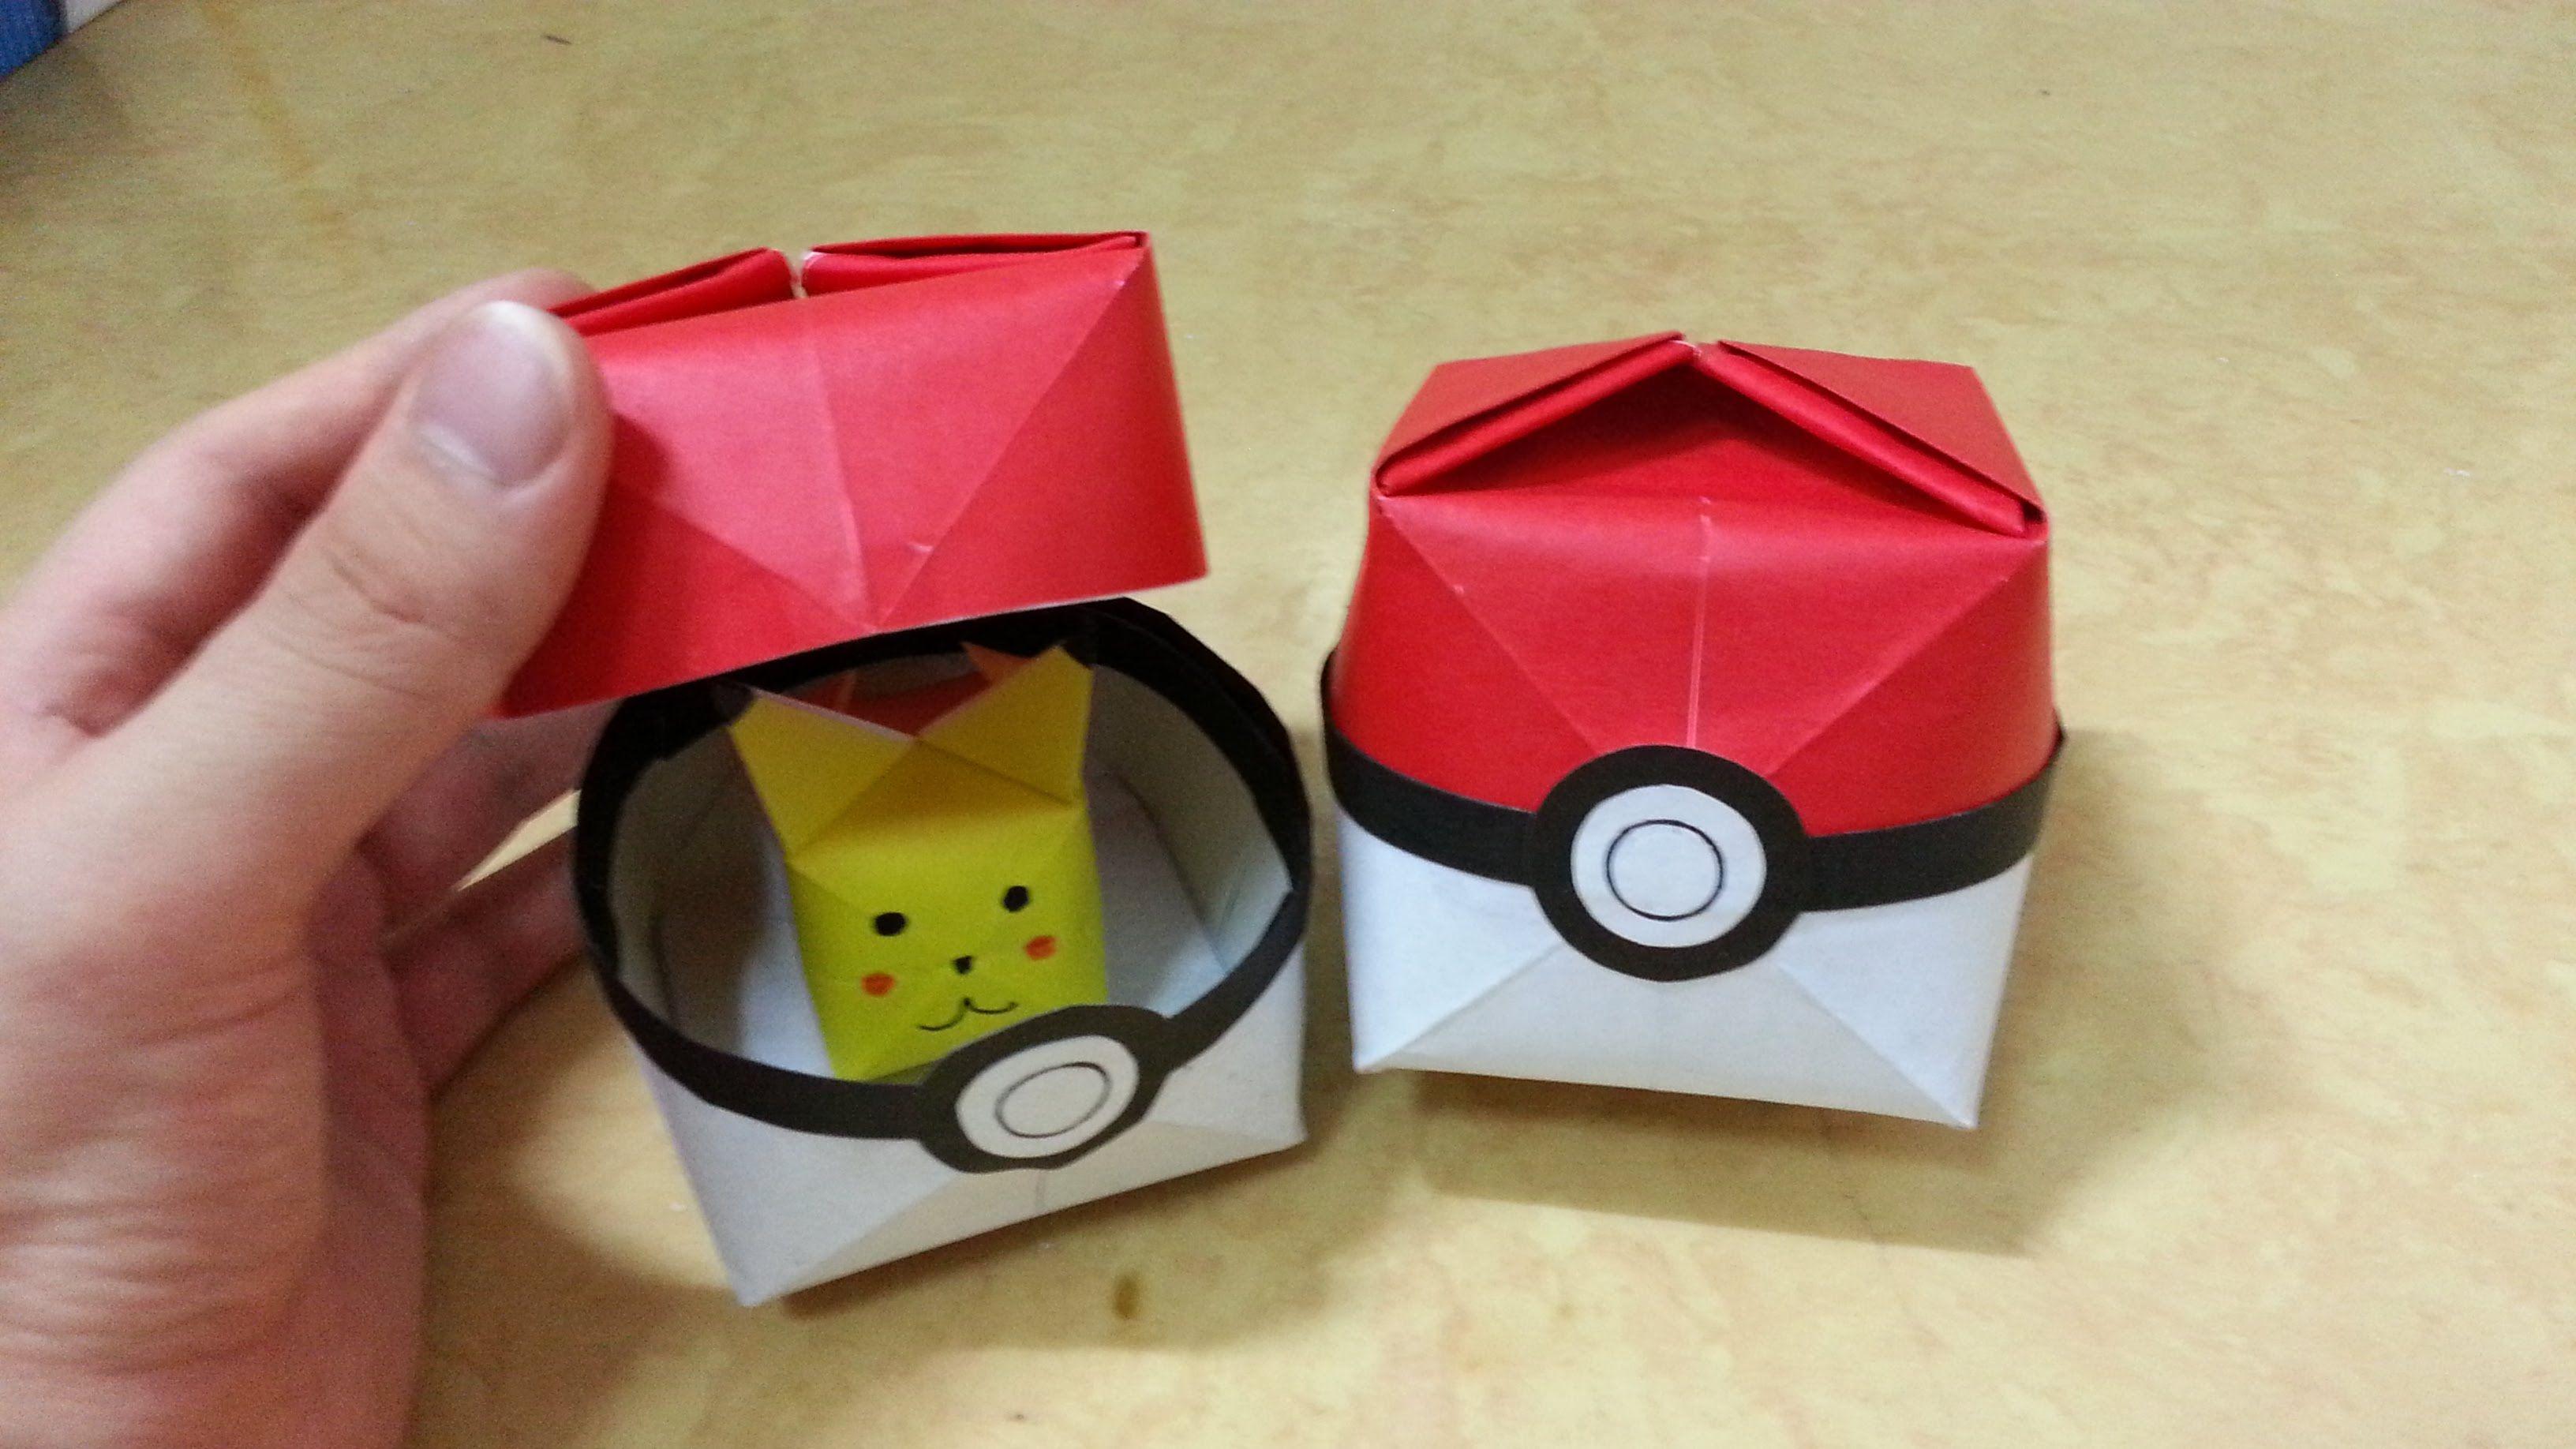 517 ������ go ������2 1 ������� origami pokeball ������� pokemon